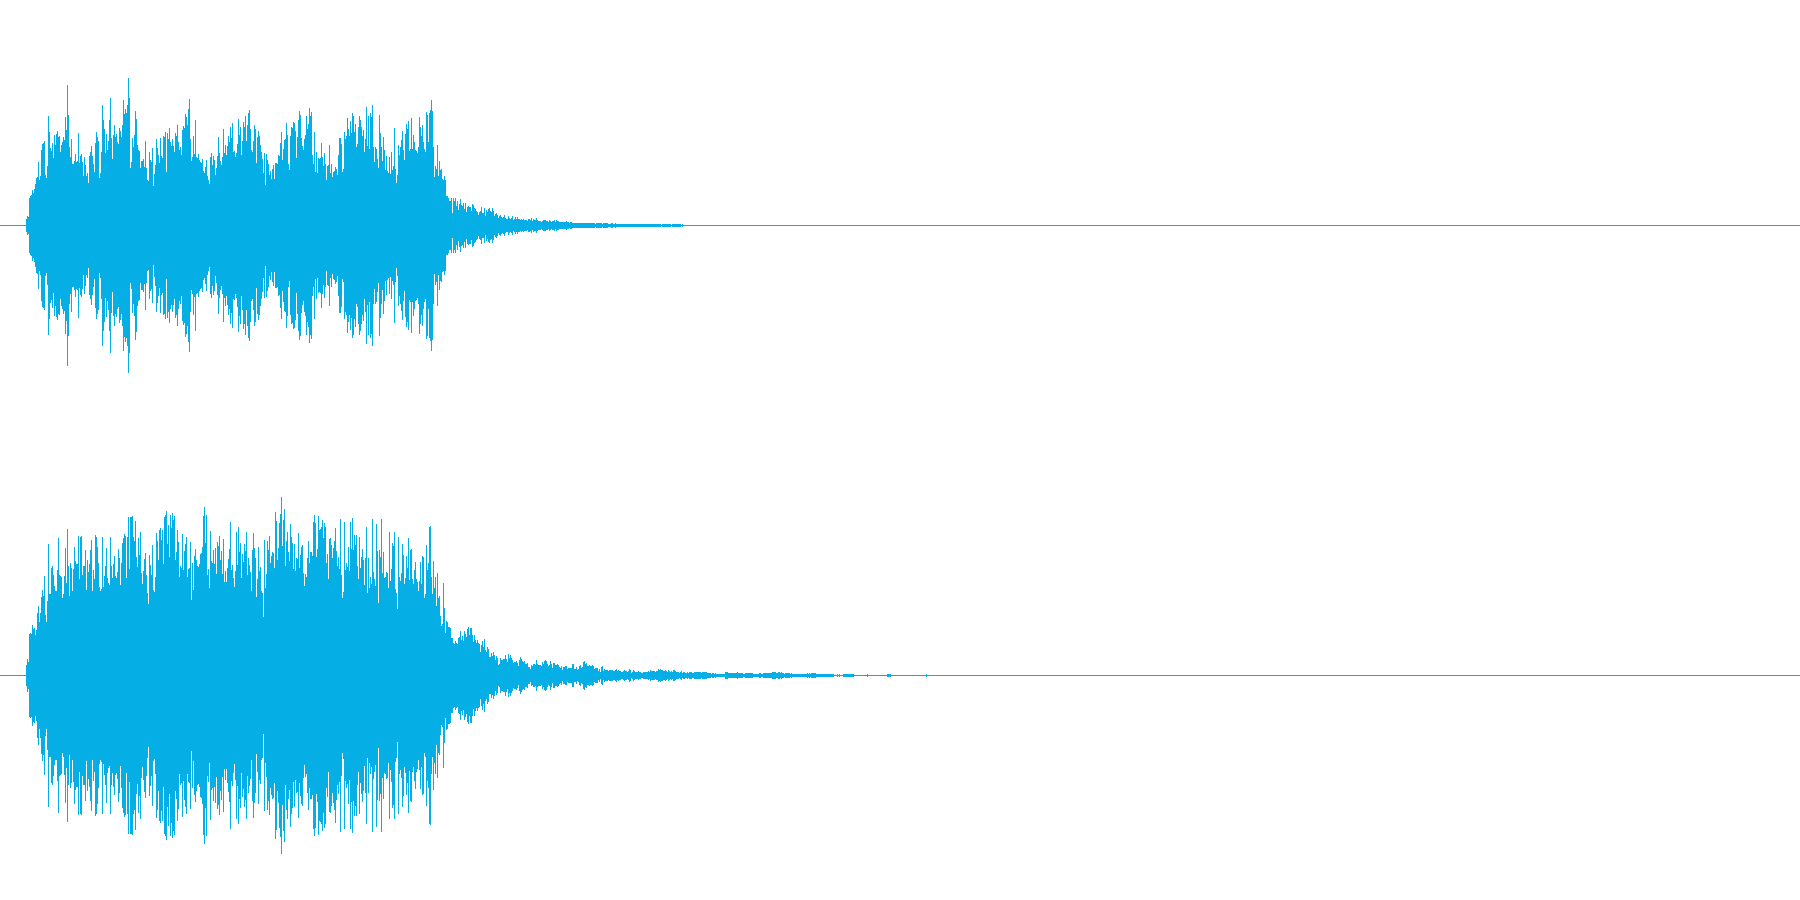 SE系ジングルの再生済みの波形